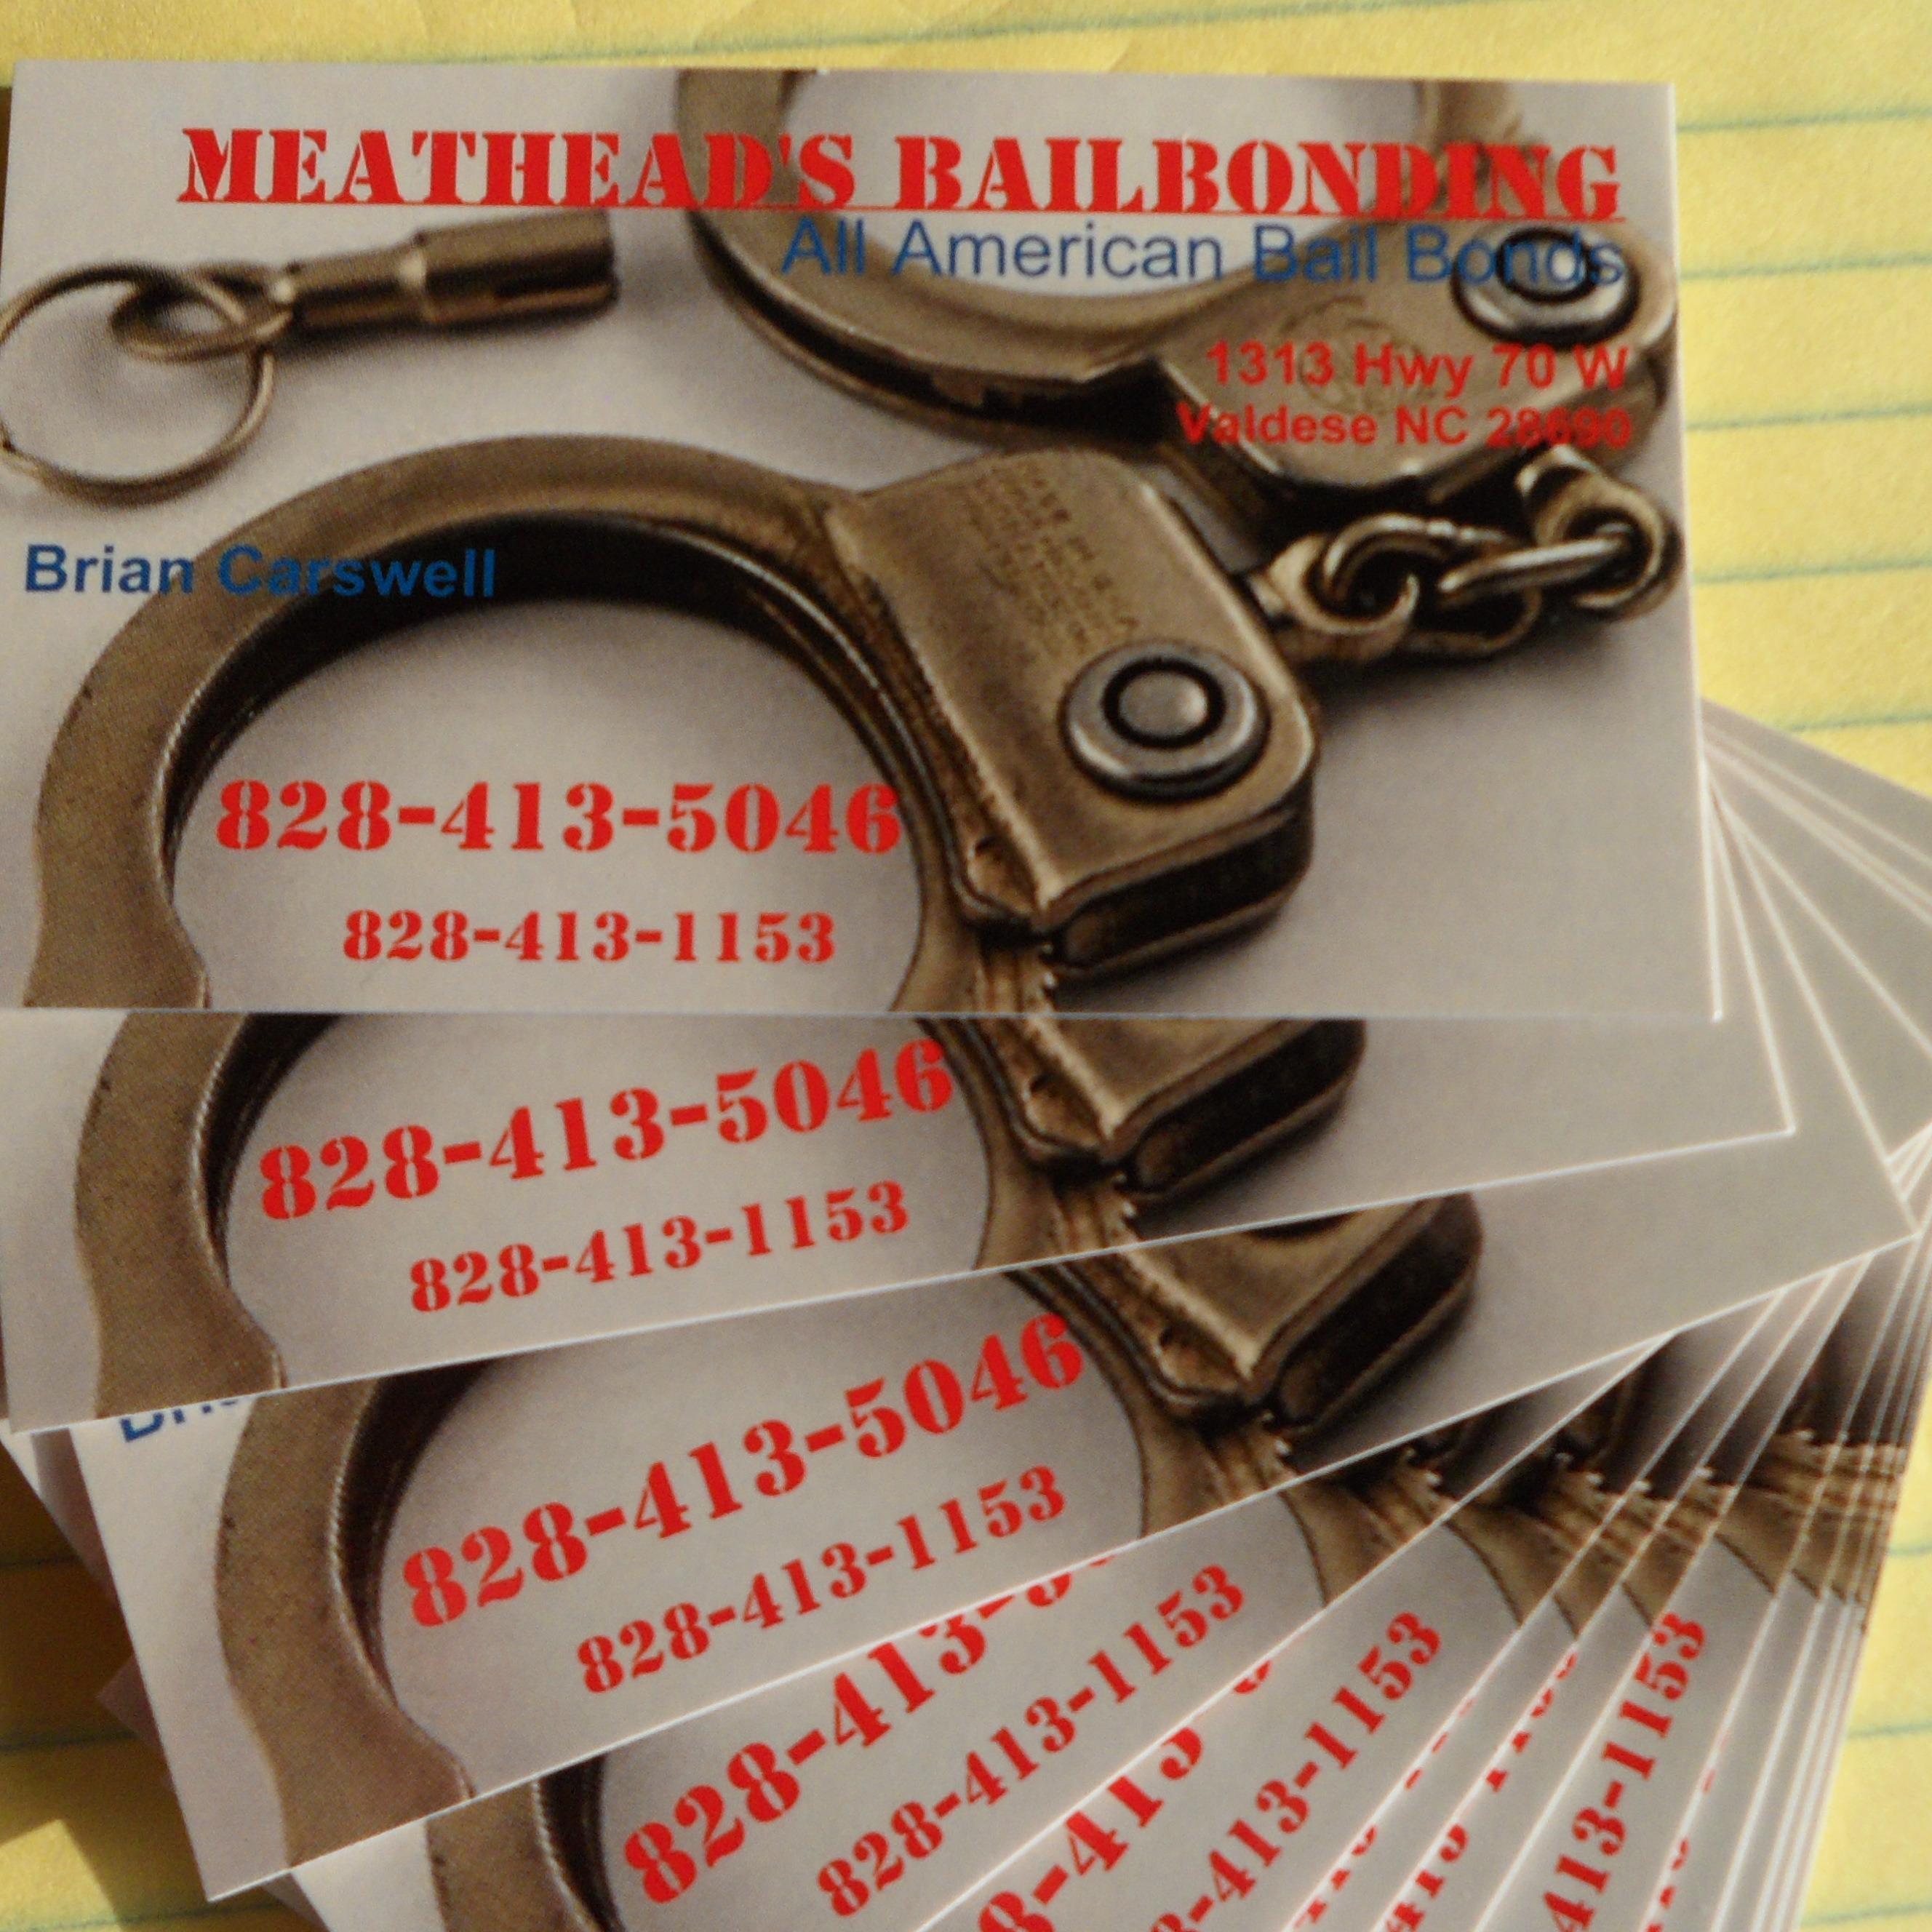 At Meatheads Bailbonding